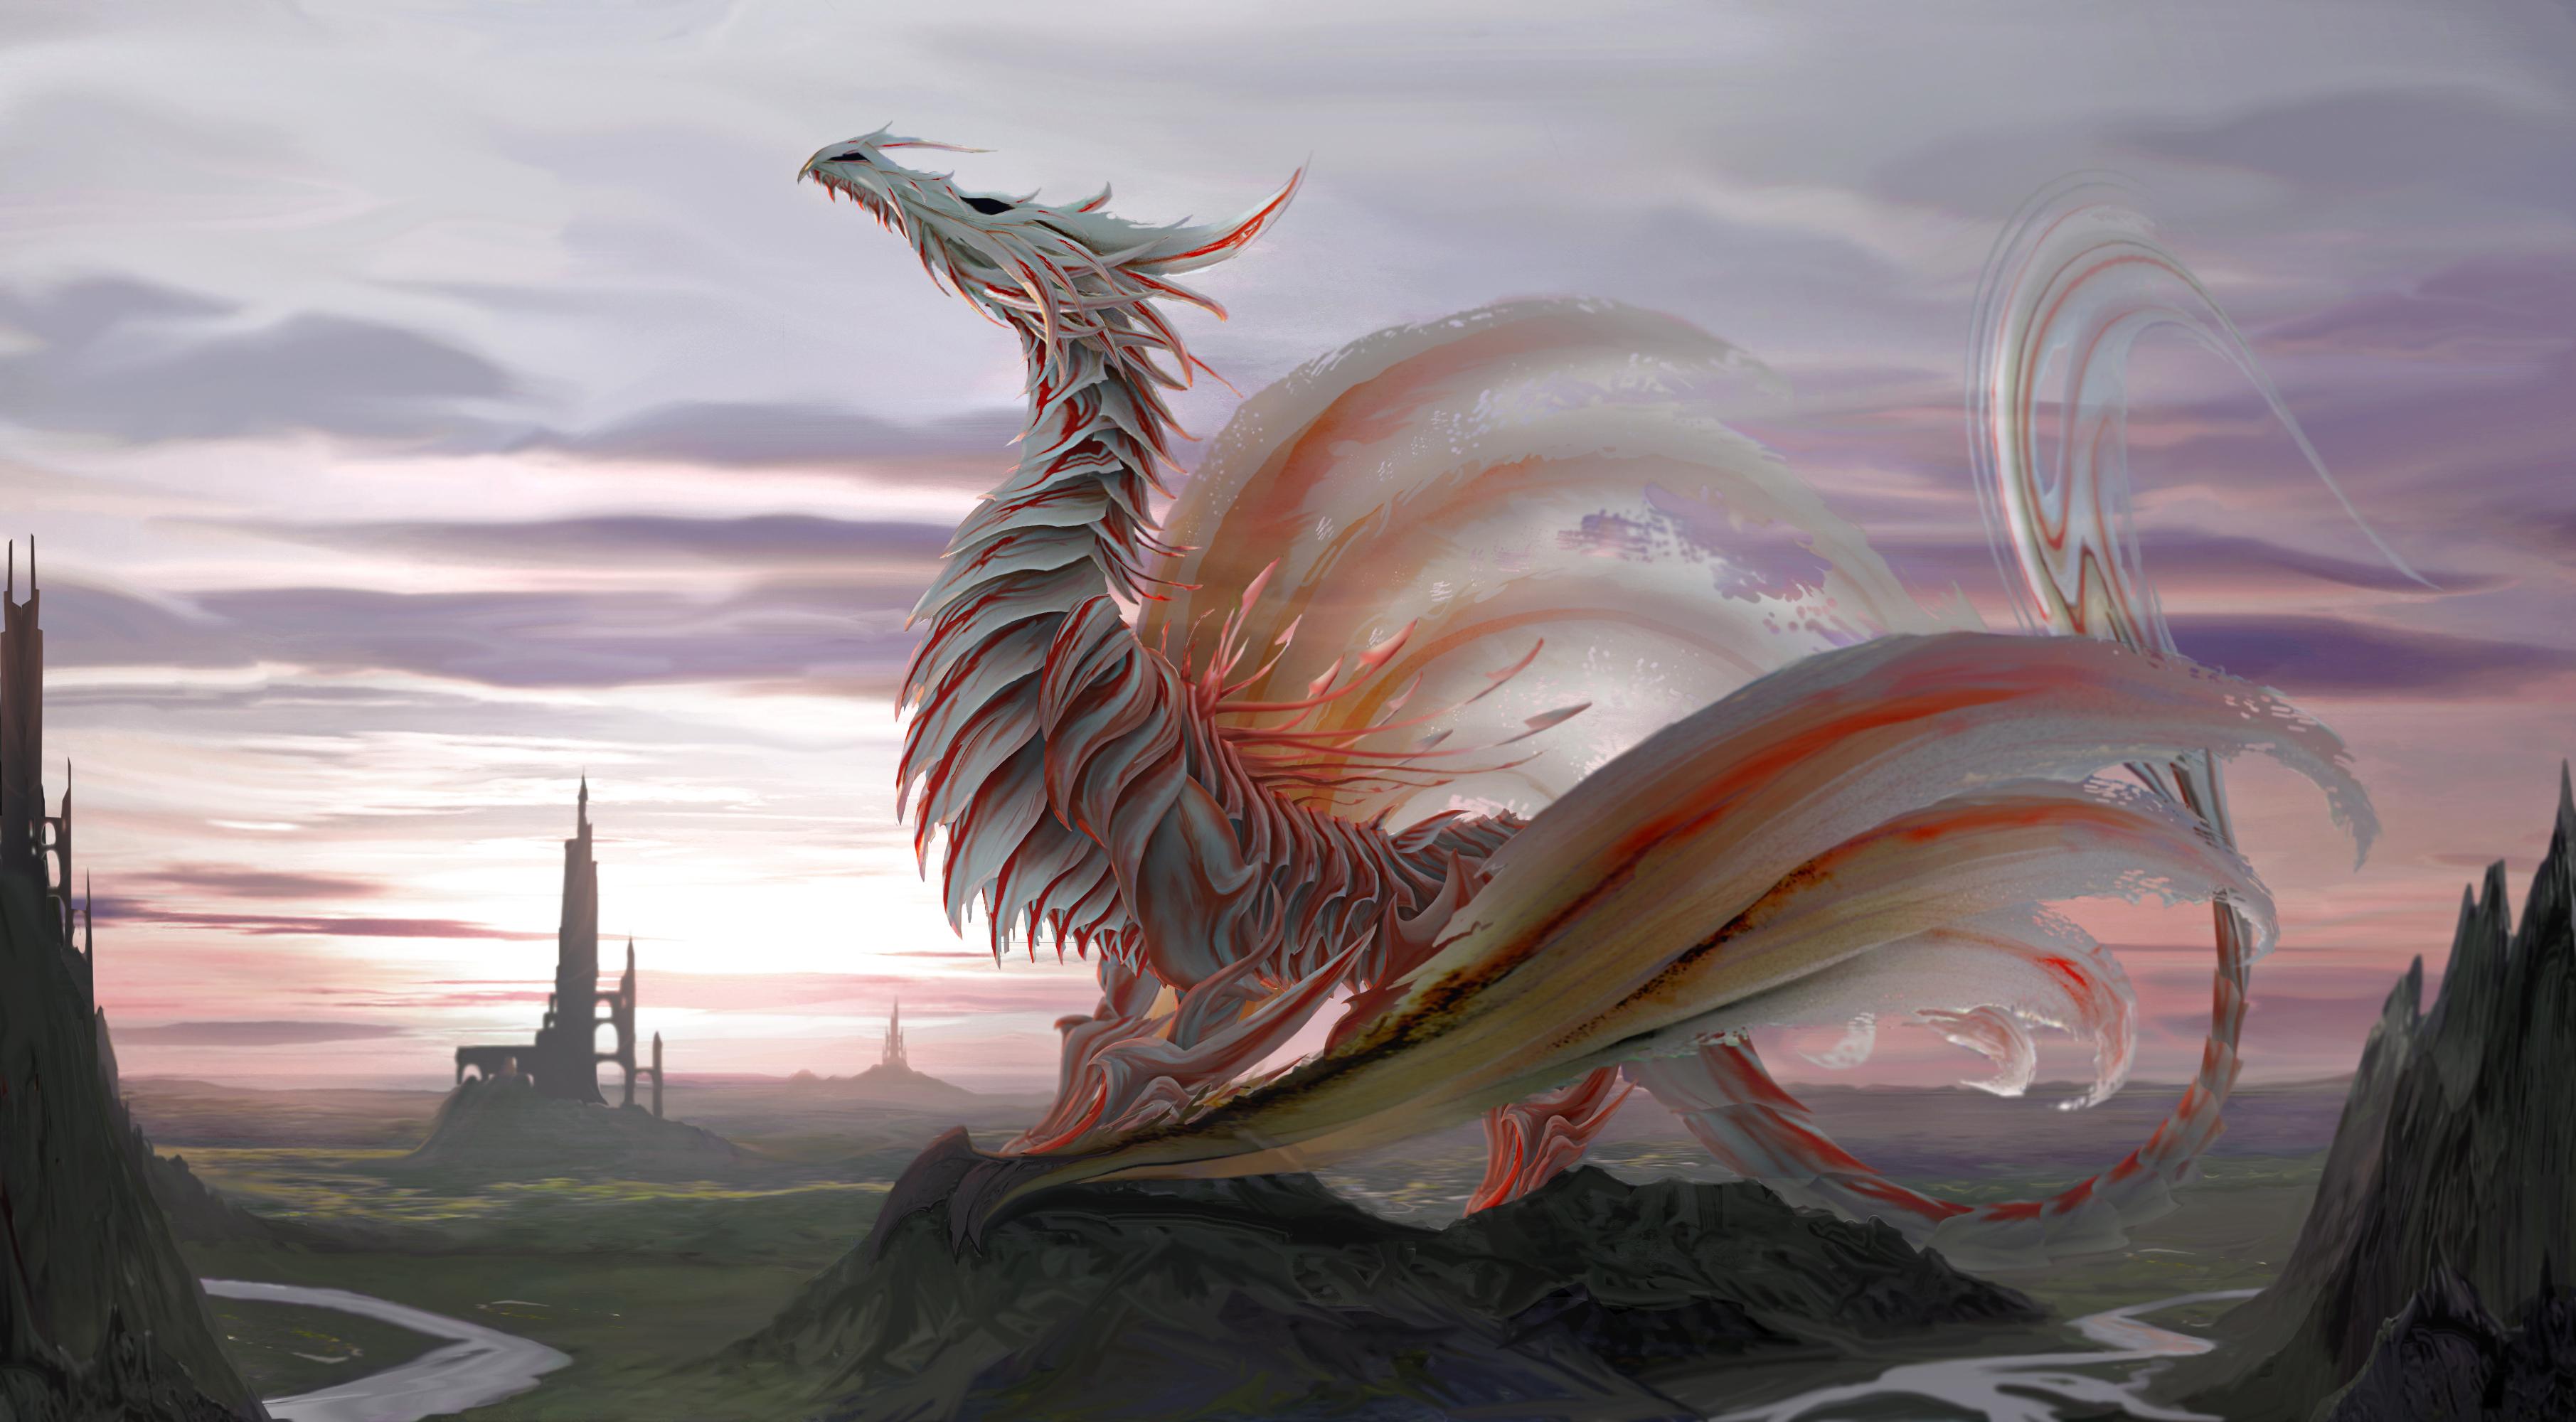 Dragon Fantasy 4k, HD Artist, 4k Wallpapers, Images ...